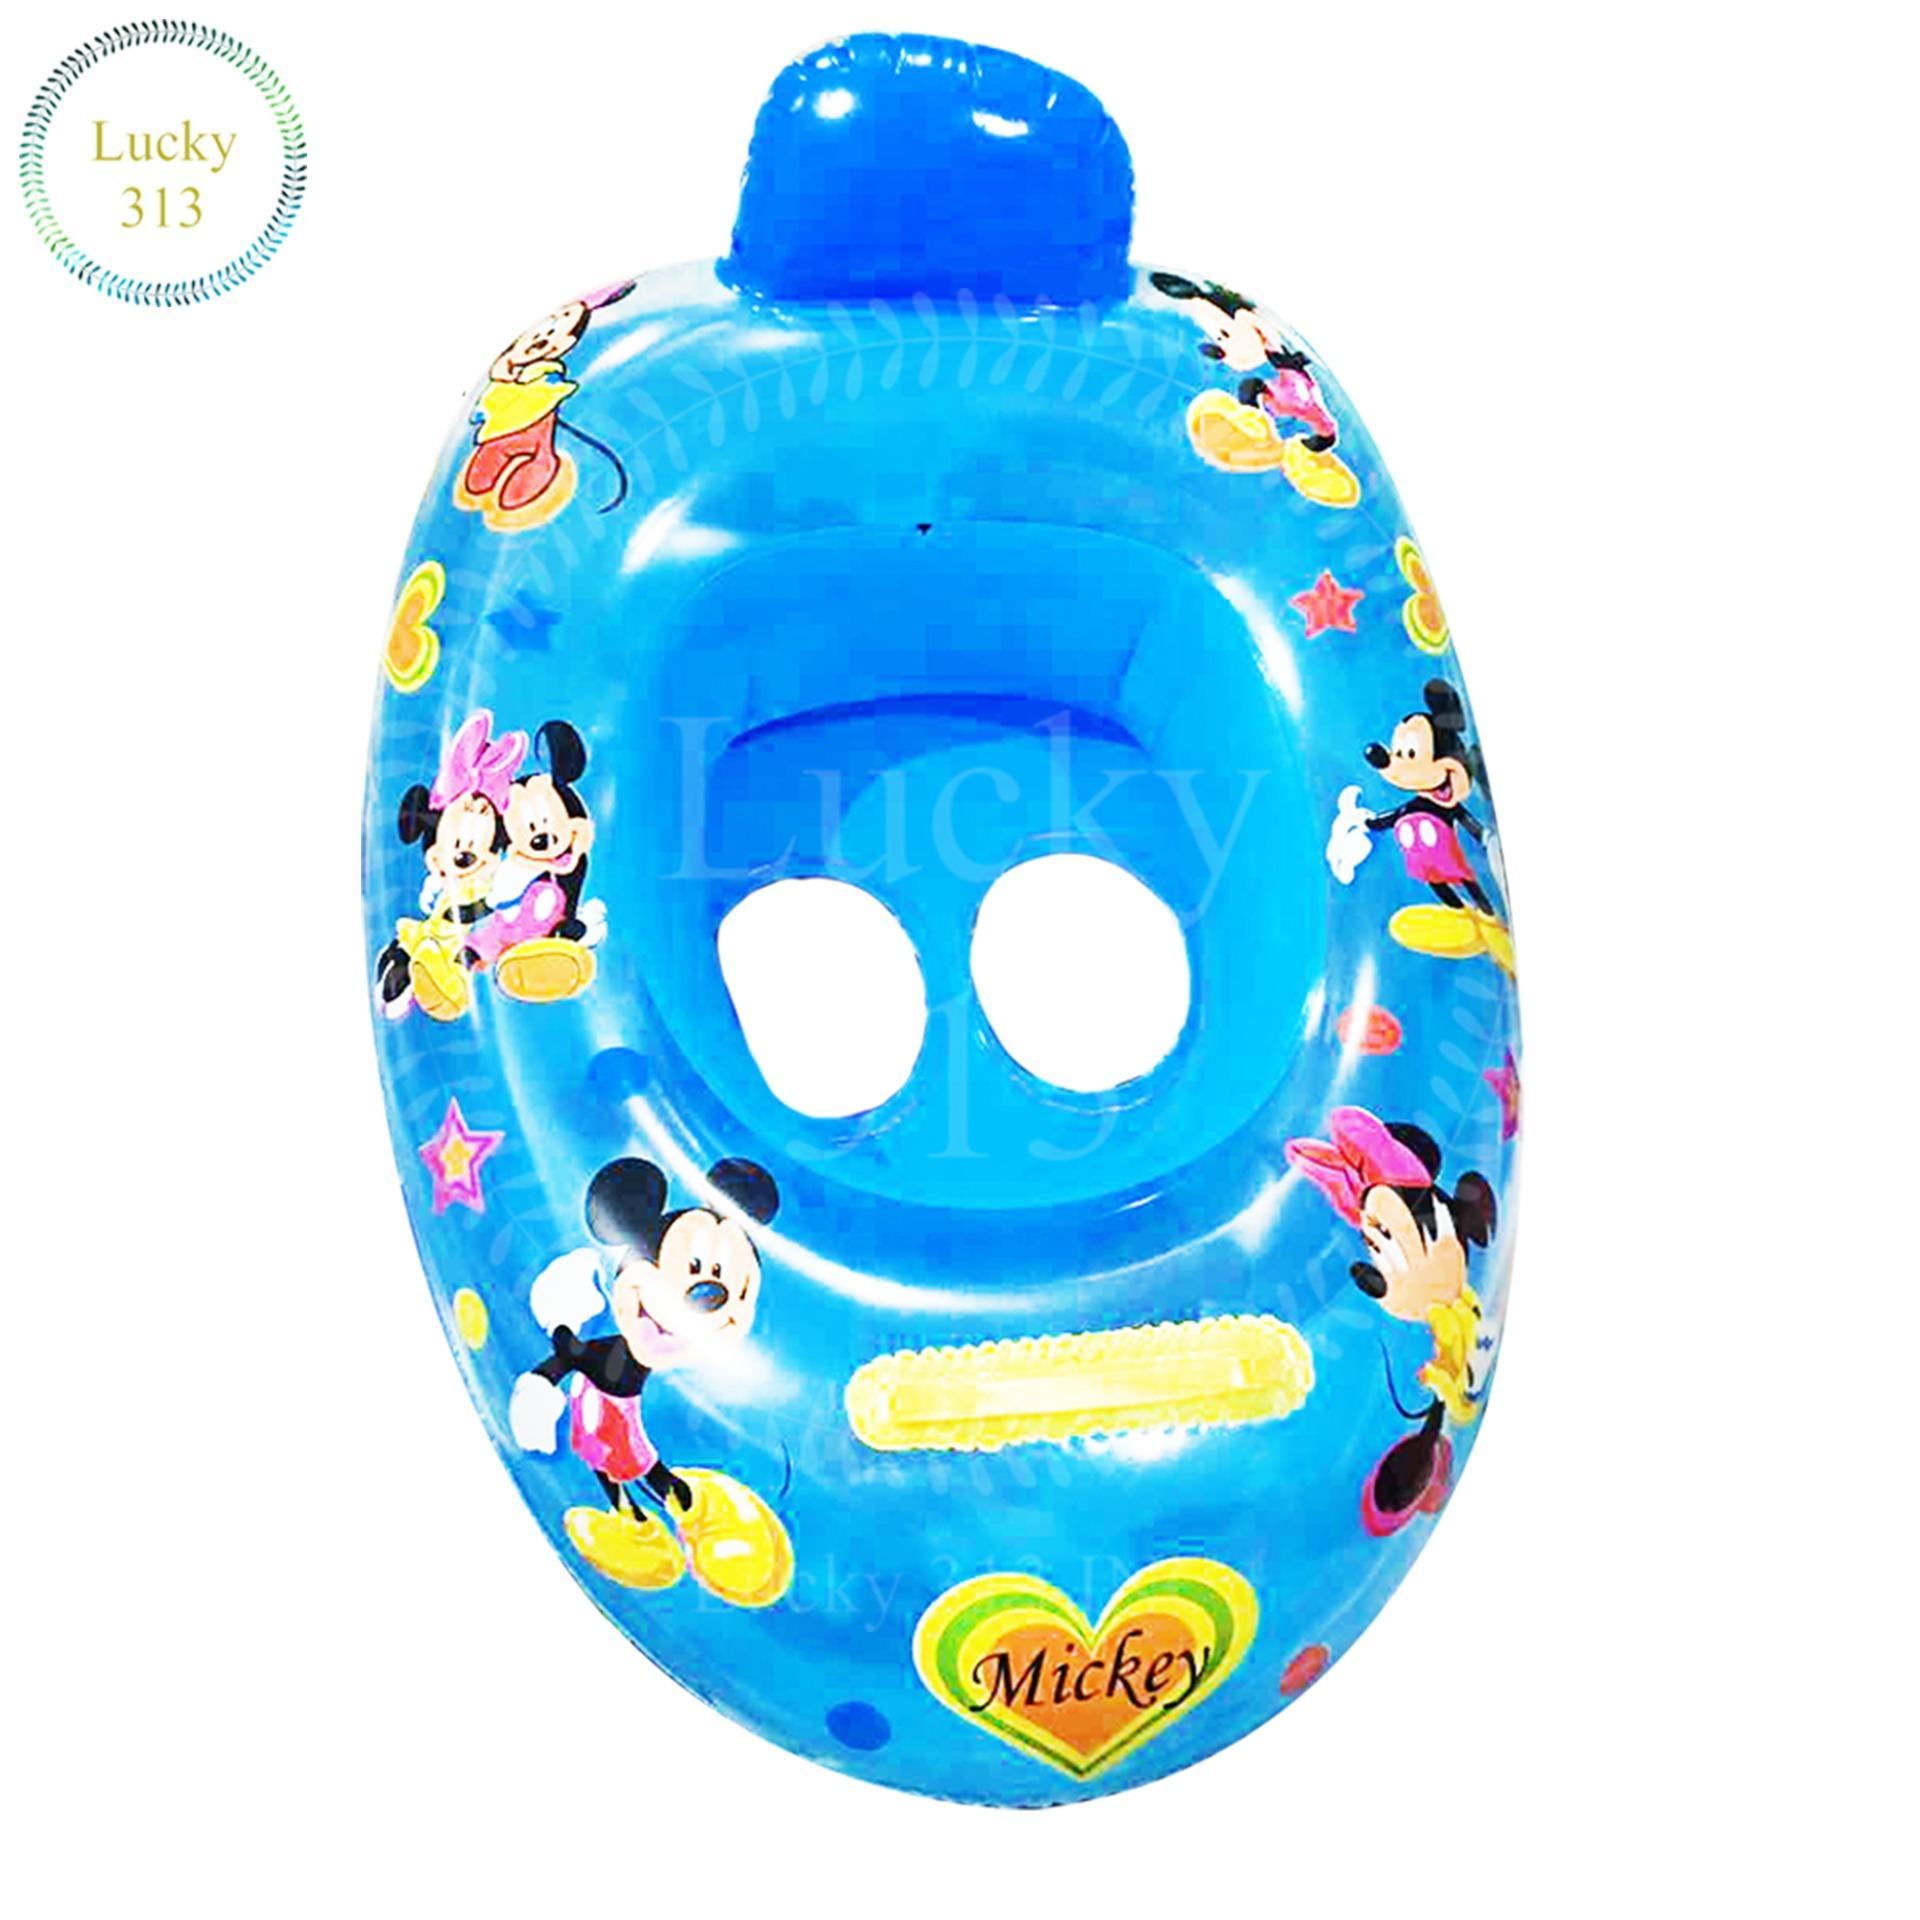 Dorable Dreambaby Bath Seat Vignette - Bathtub Ideas - dilata.info